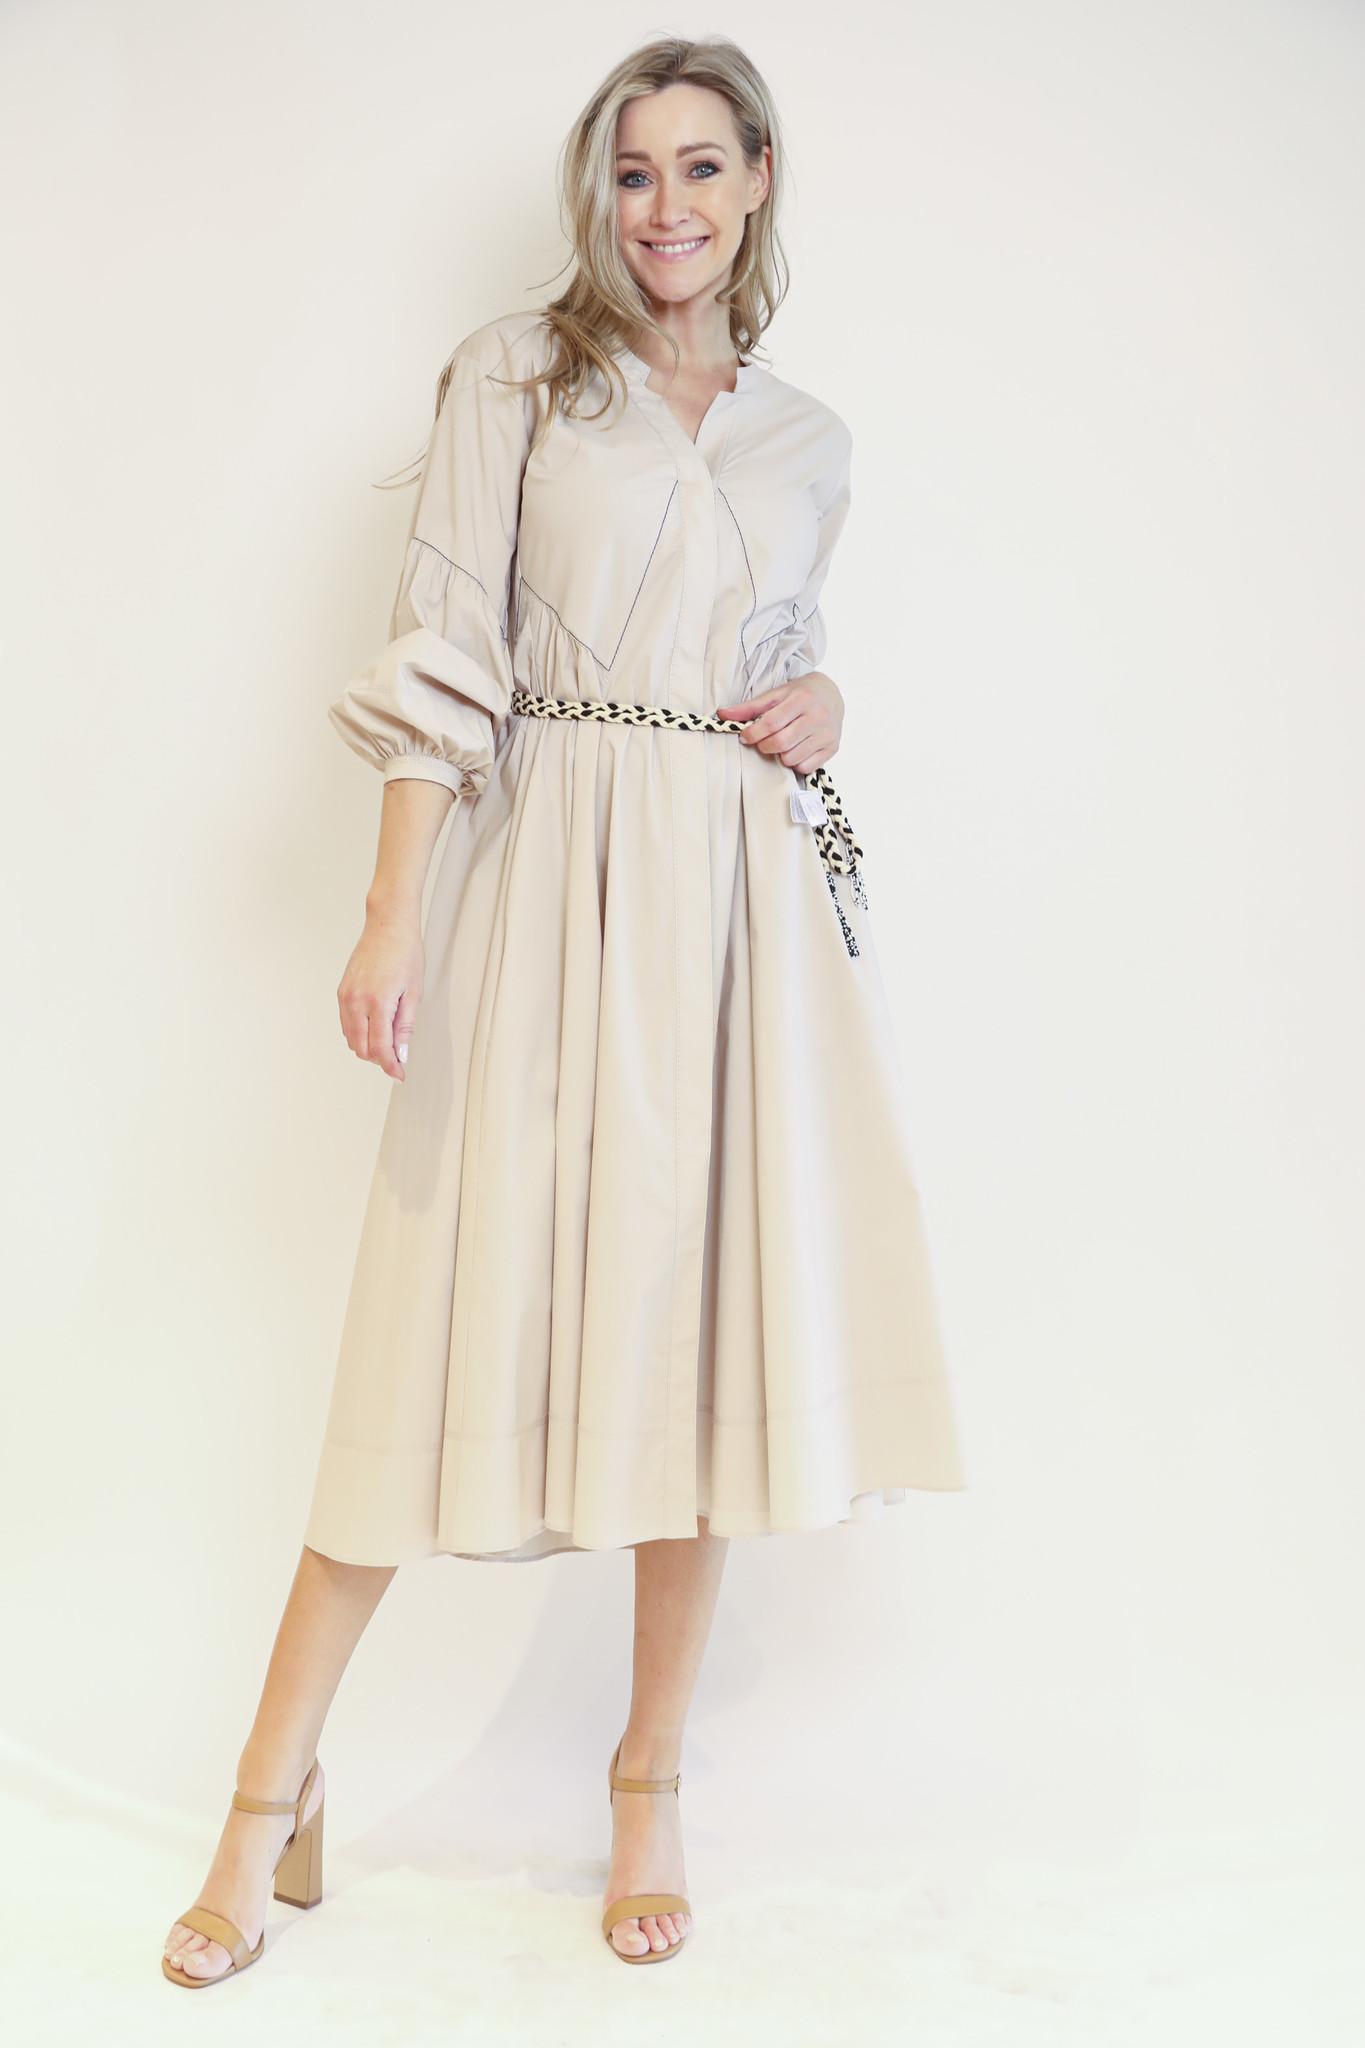 Popeline power dress dorothee schumacher-3